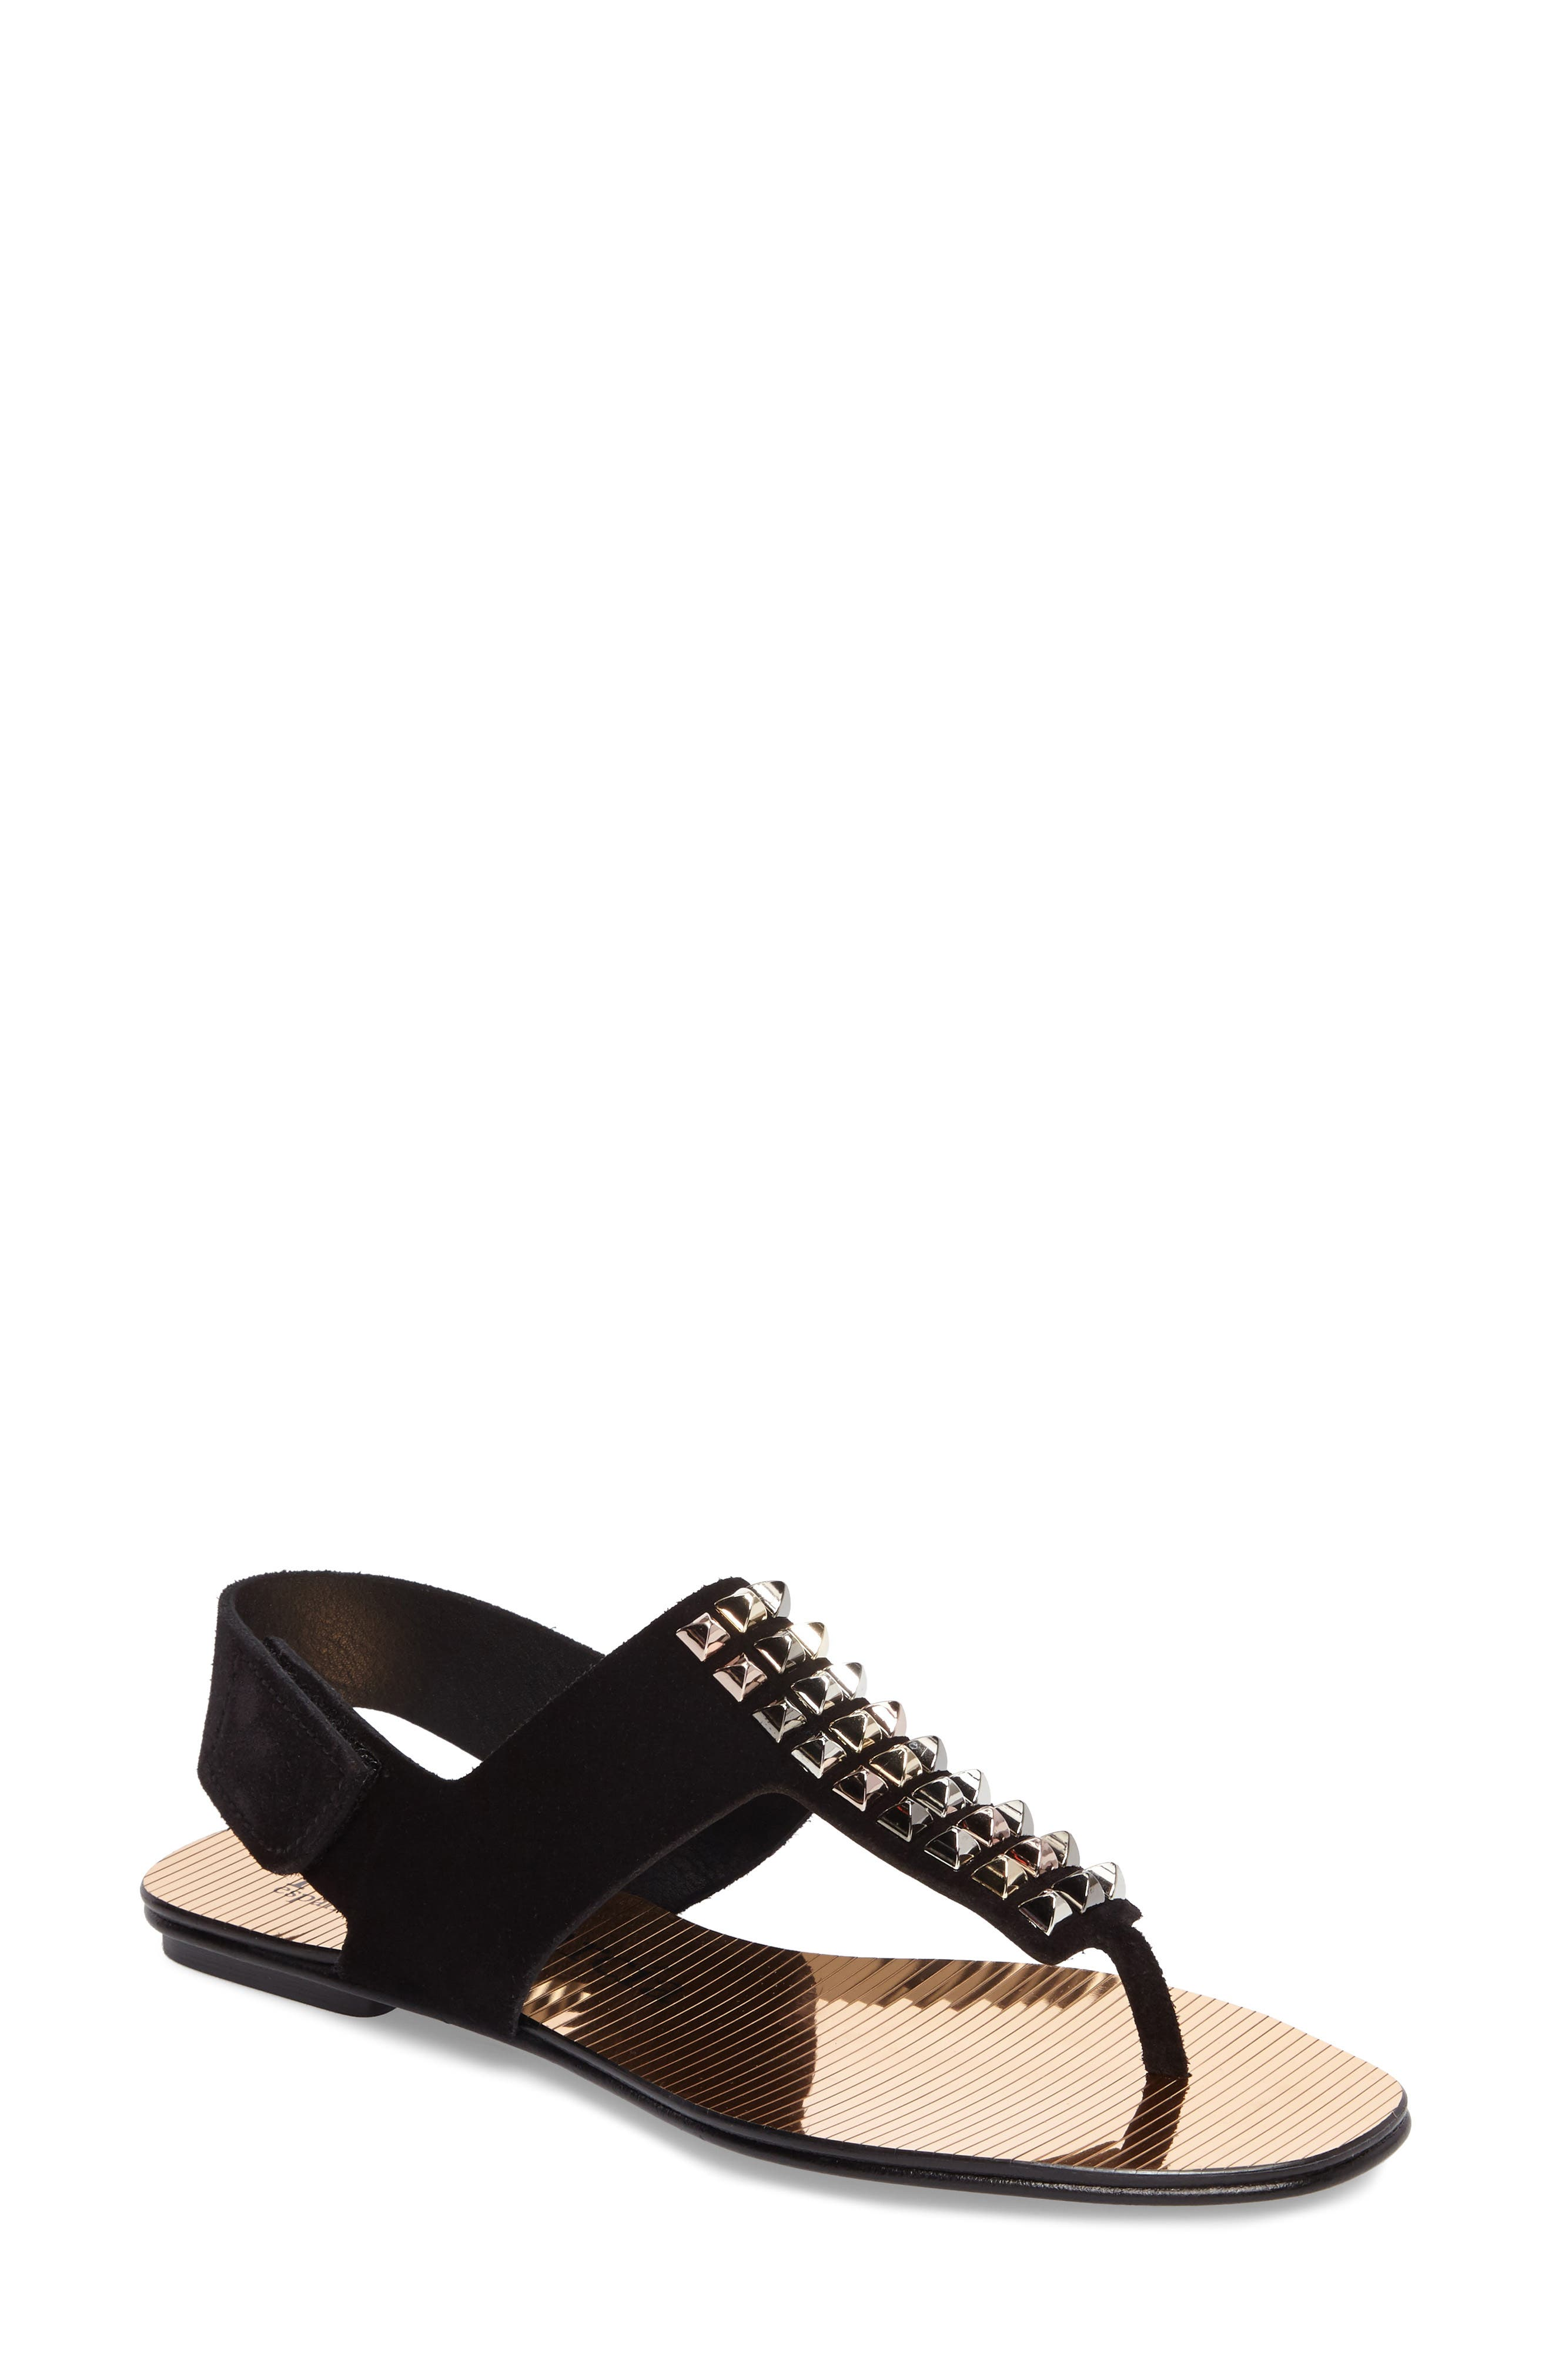 Enid Studded T-Strap Sandal,                         Main,                         color, Black Castoro/ Gold